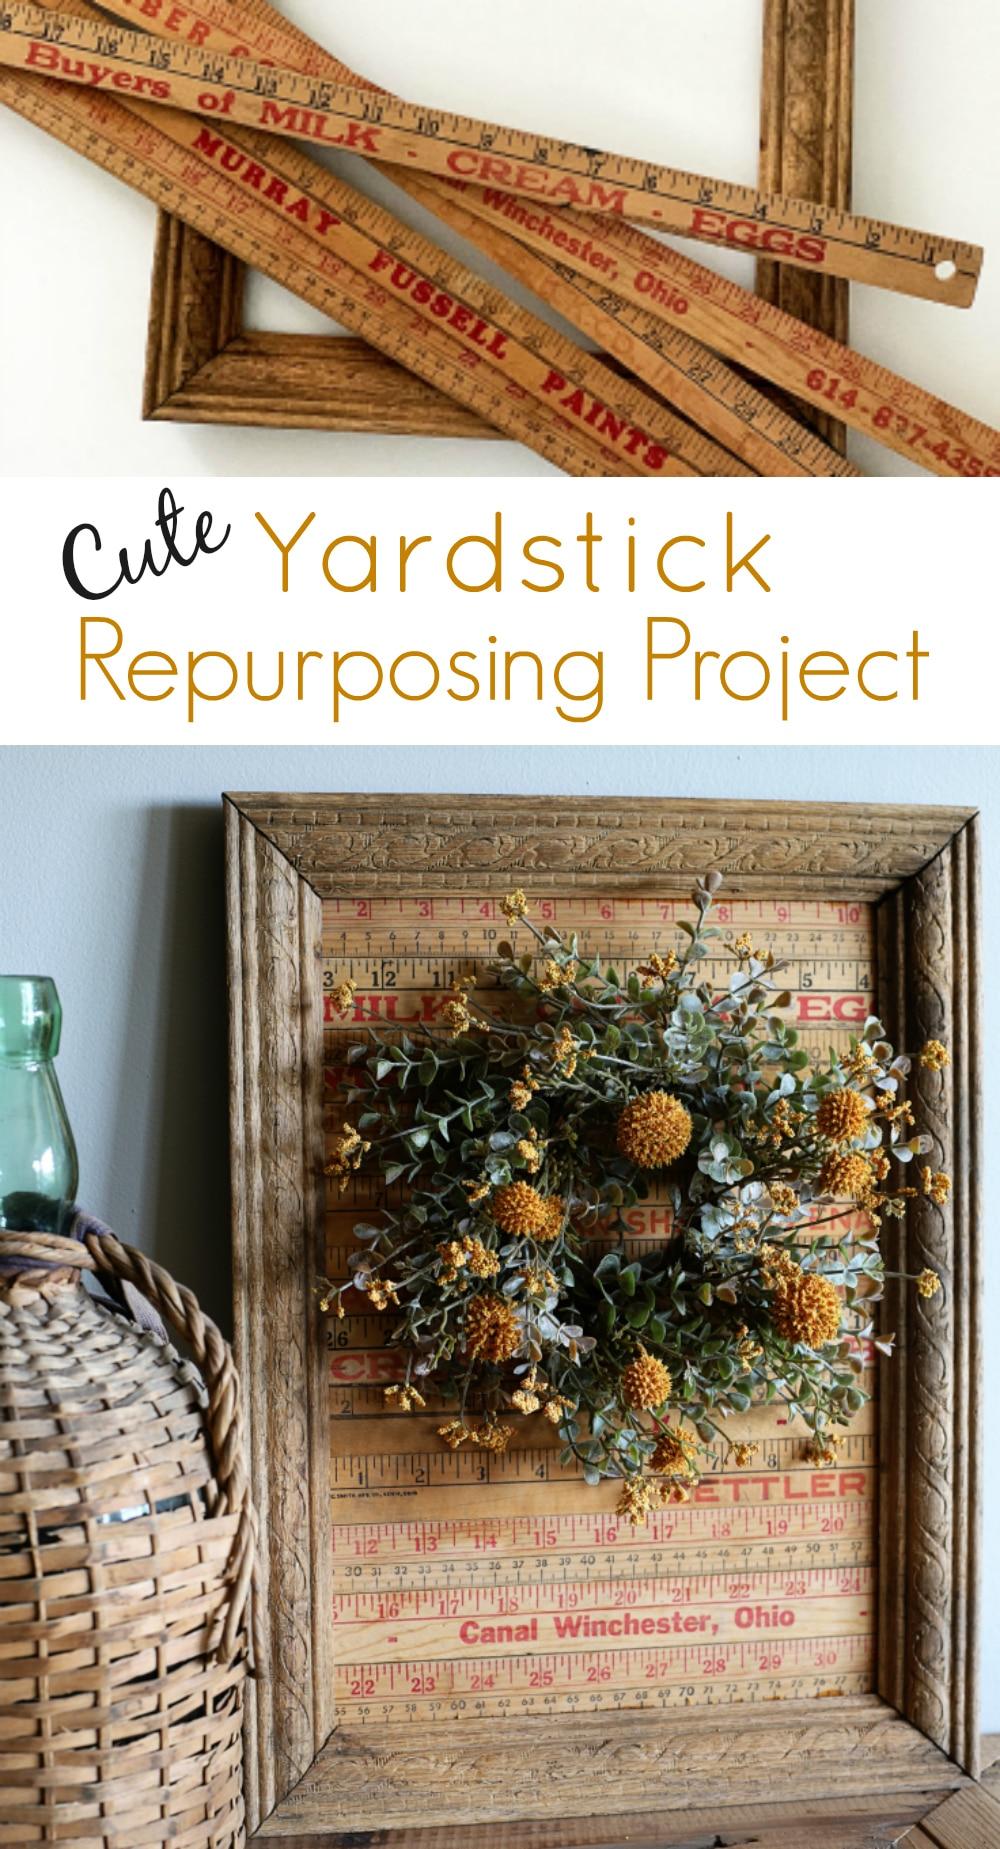 Yardstick Repurposing Project